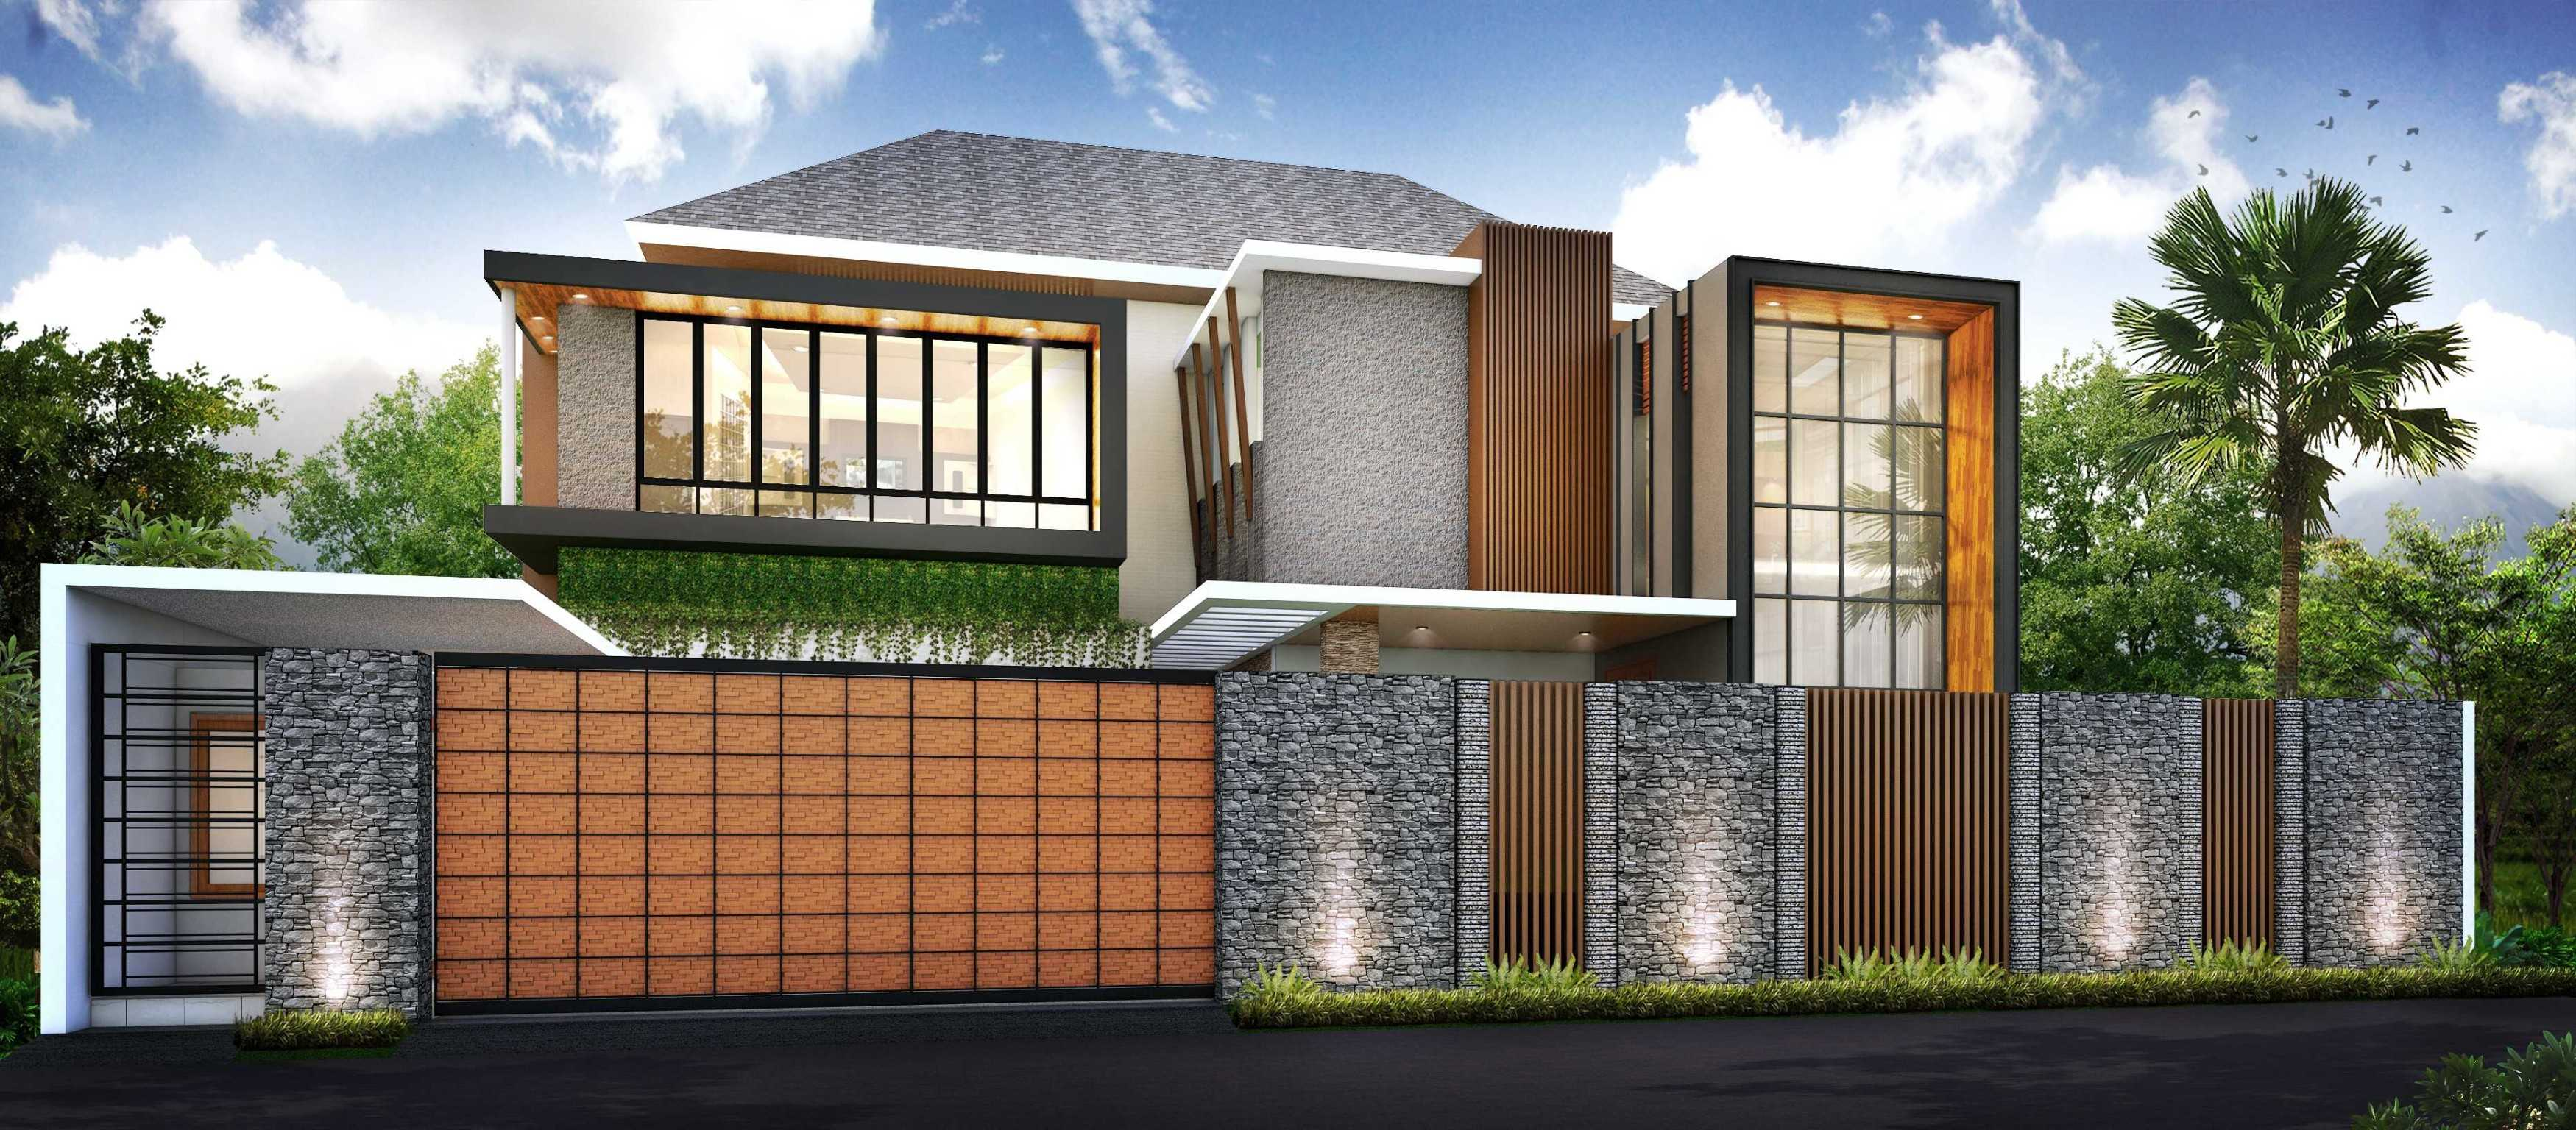 Hendra Budi Architect Privat House Klaten Klaten, Jawa Tengah Klaten, Jawa Tengah Front View Modern  16451